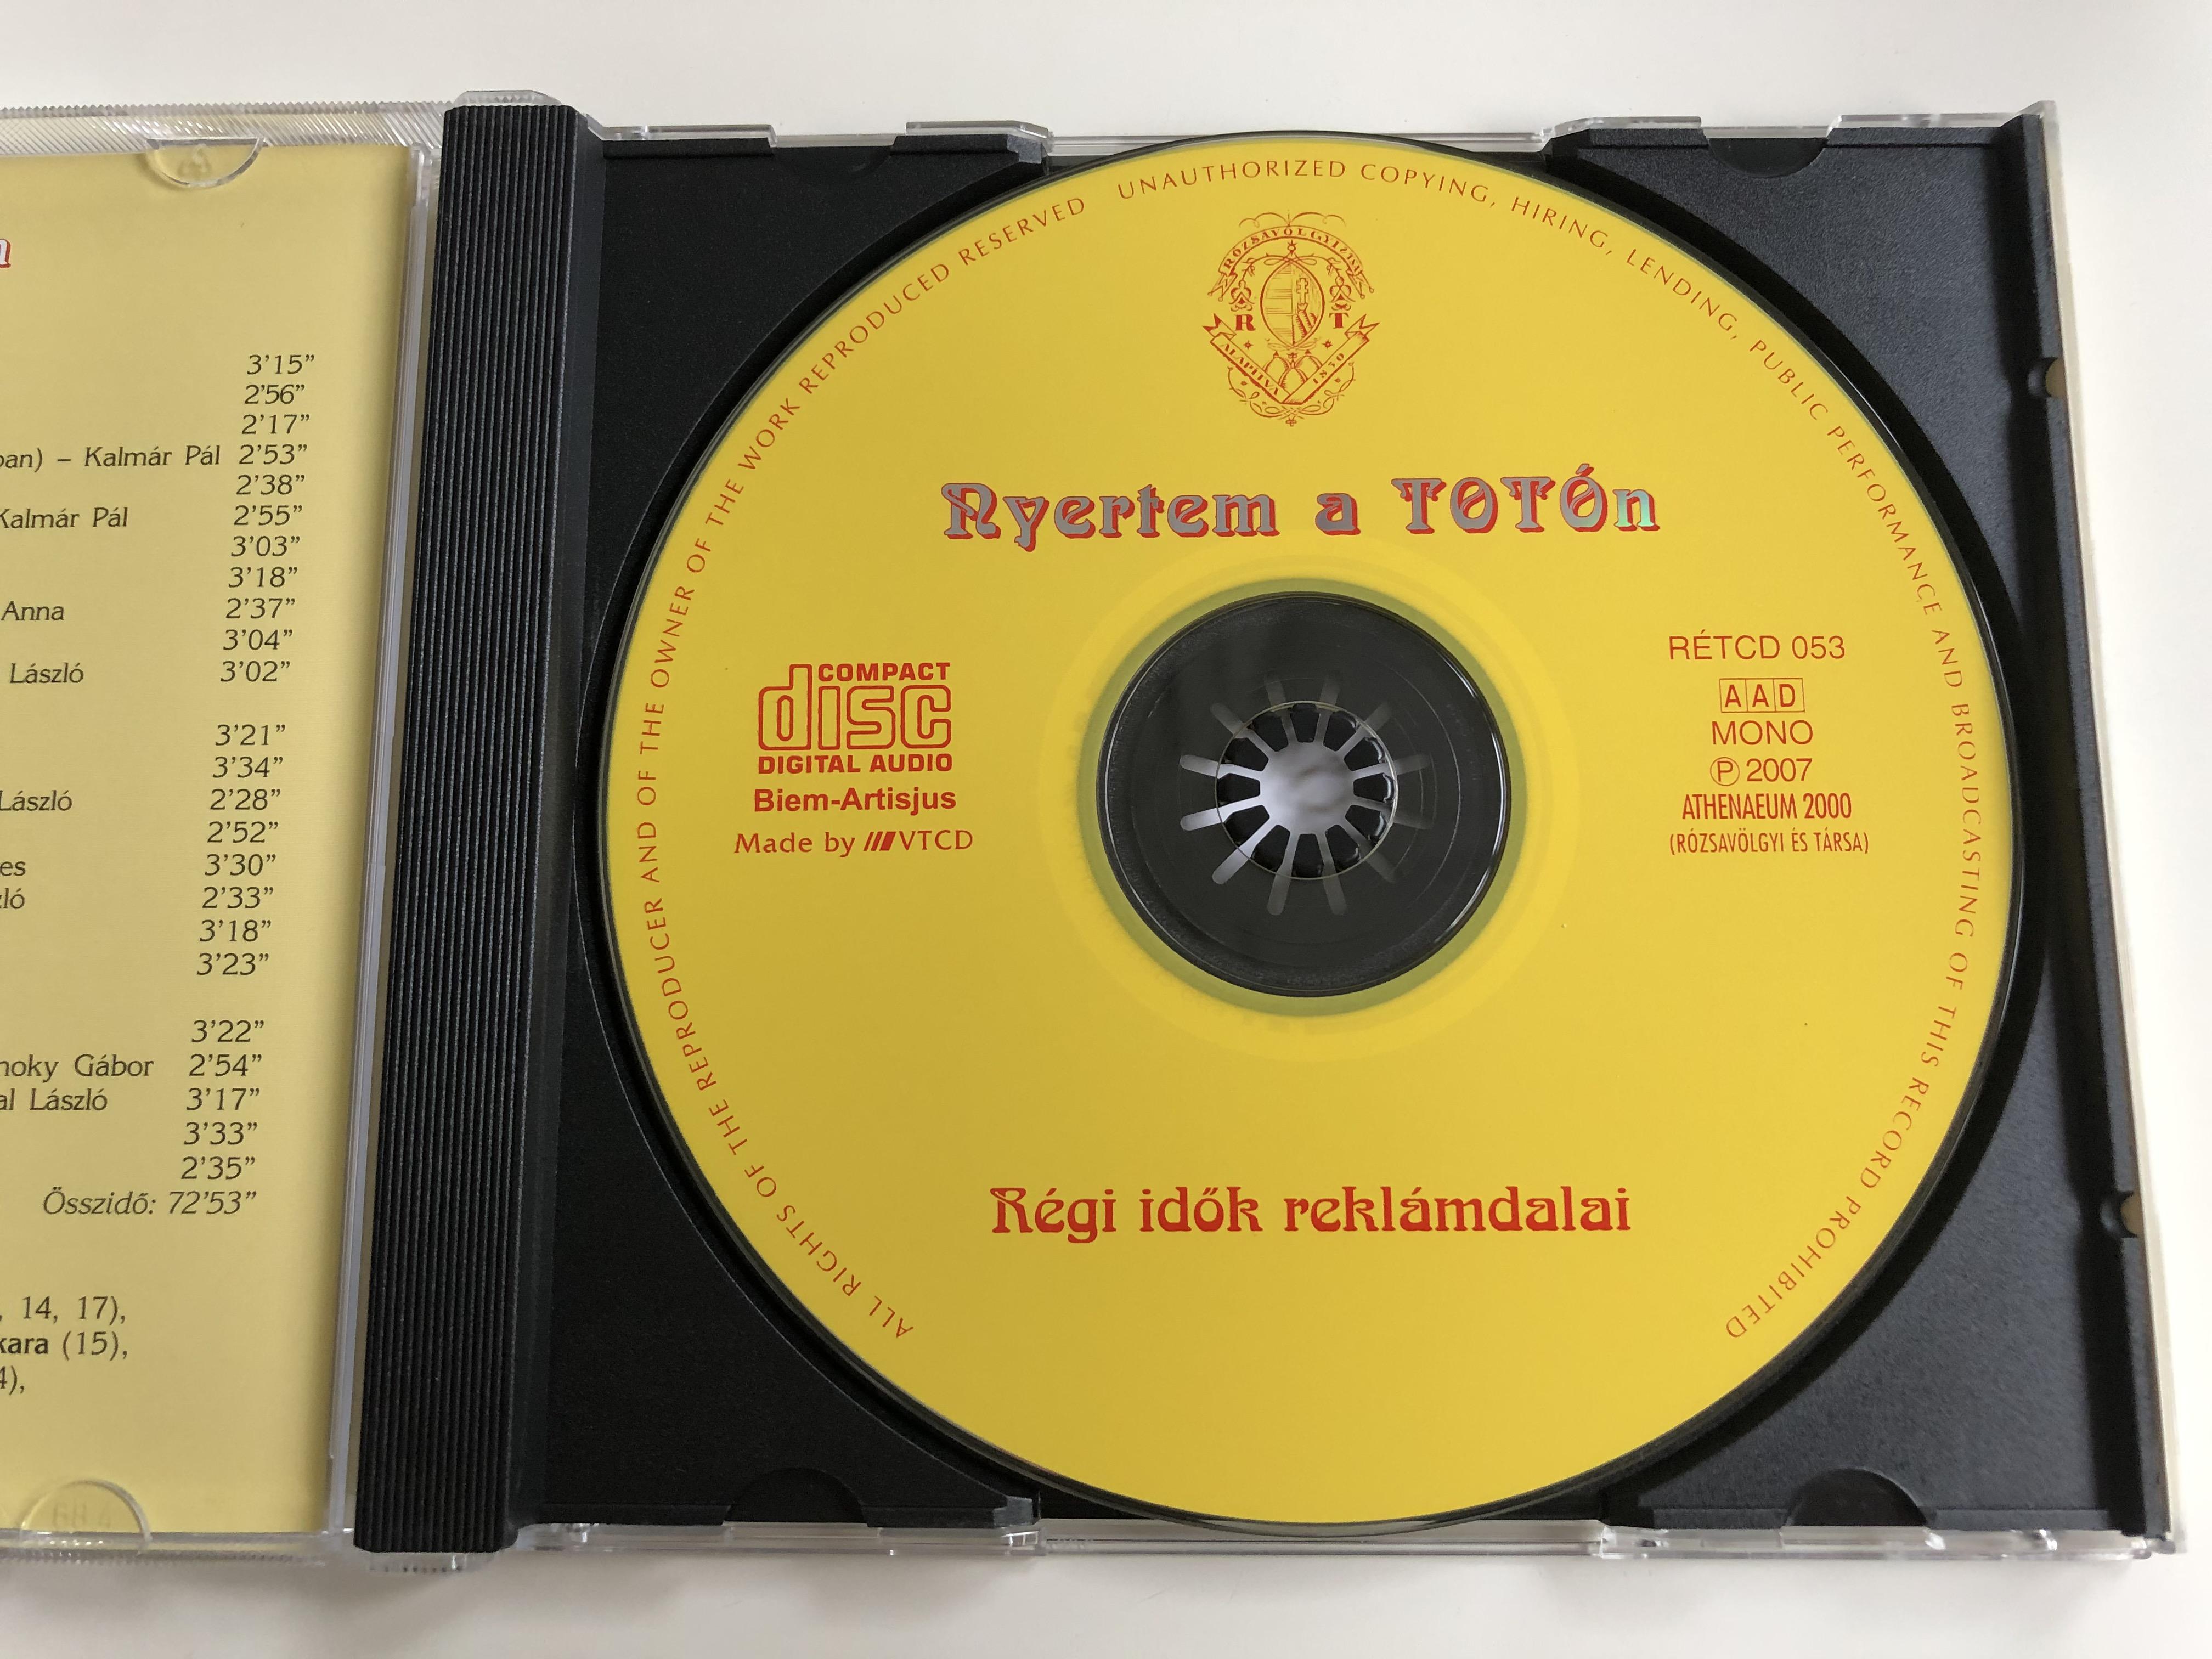 nyertem-a-tot-n-r-gi-id-k-rekl-mdalai-r-zsav-lgyi-s-t-rsa-audio-cd-2007-mono-r-tcd-53-5-.jpg